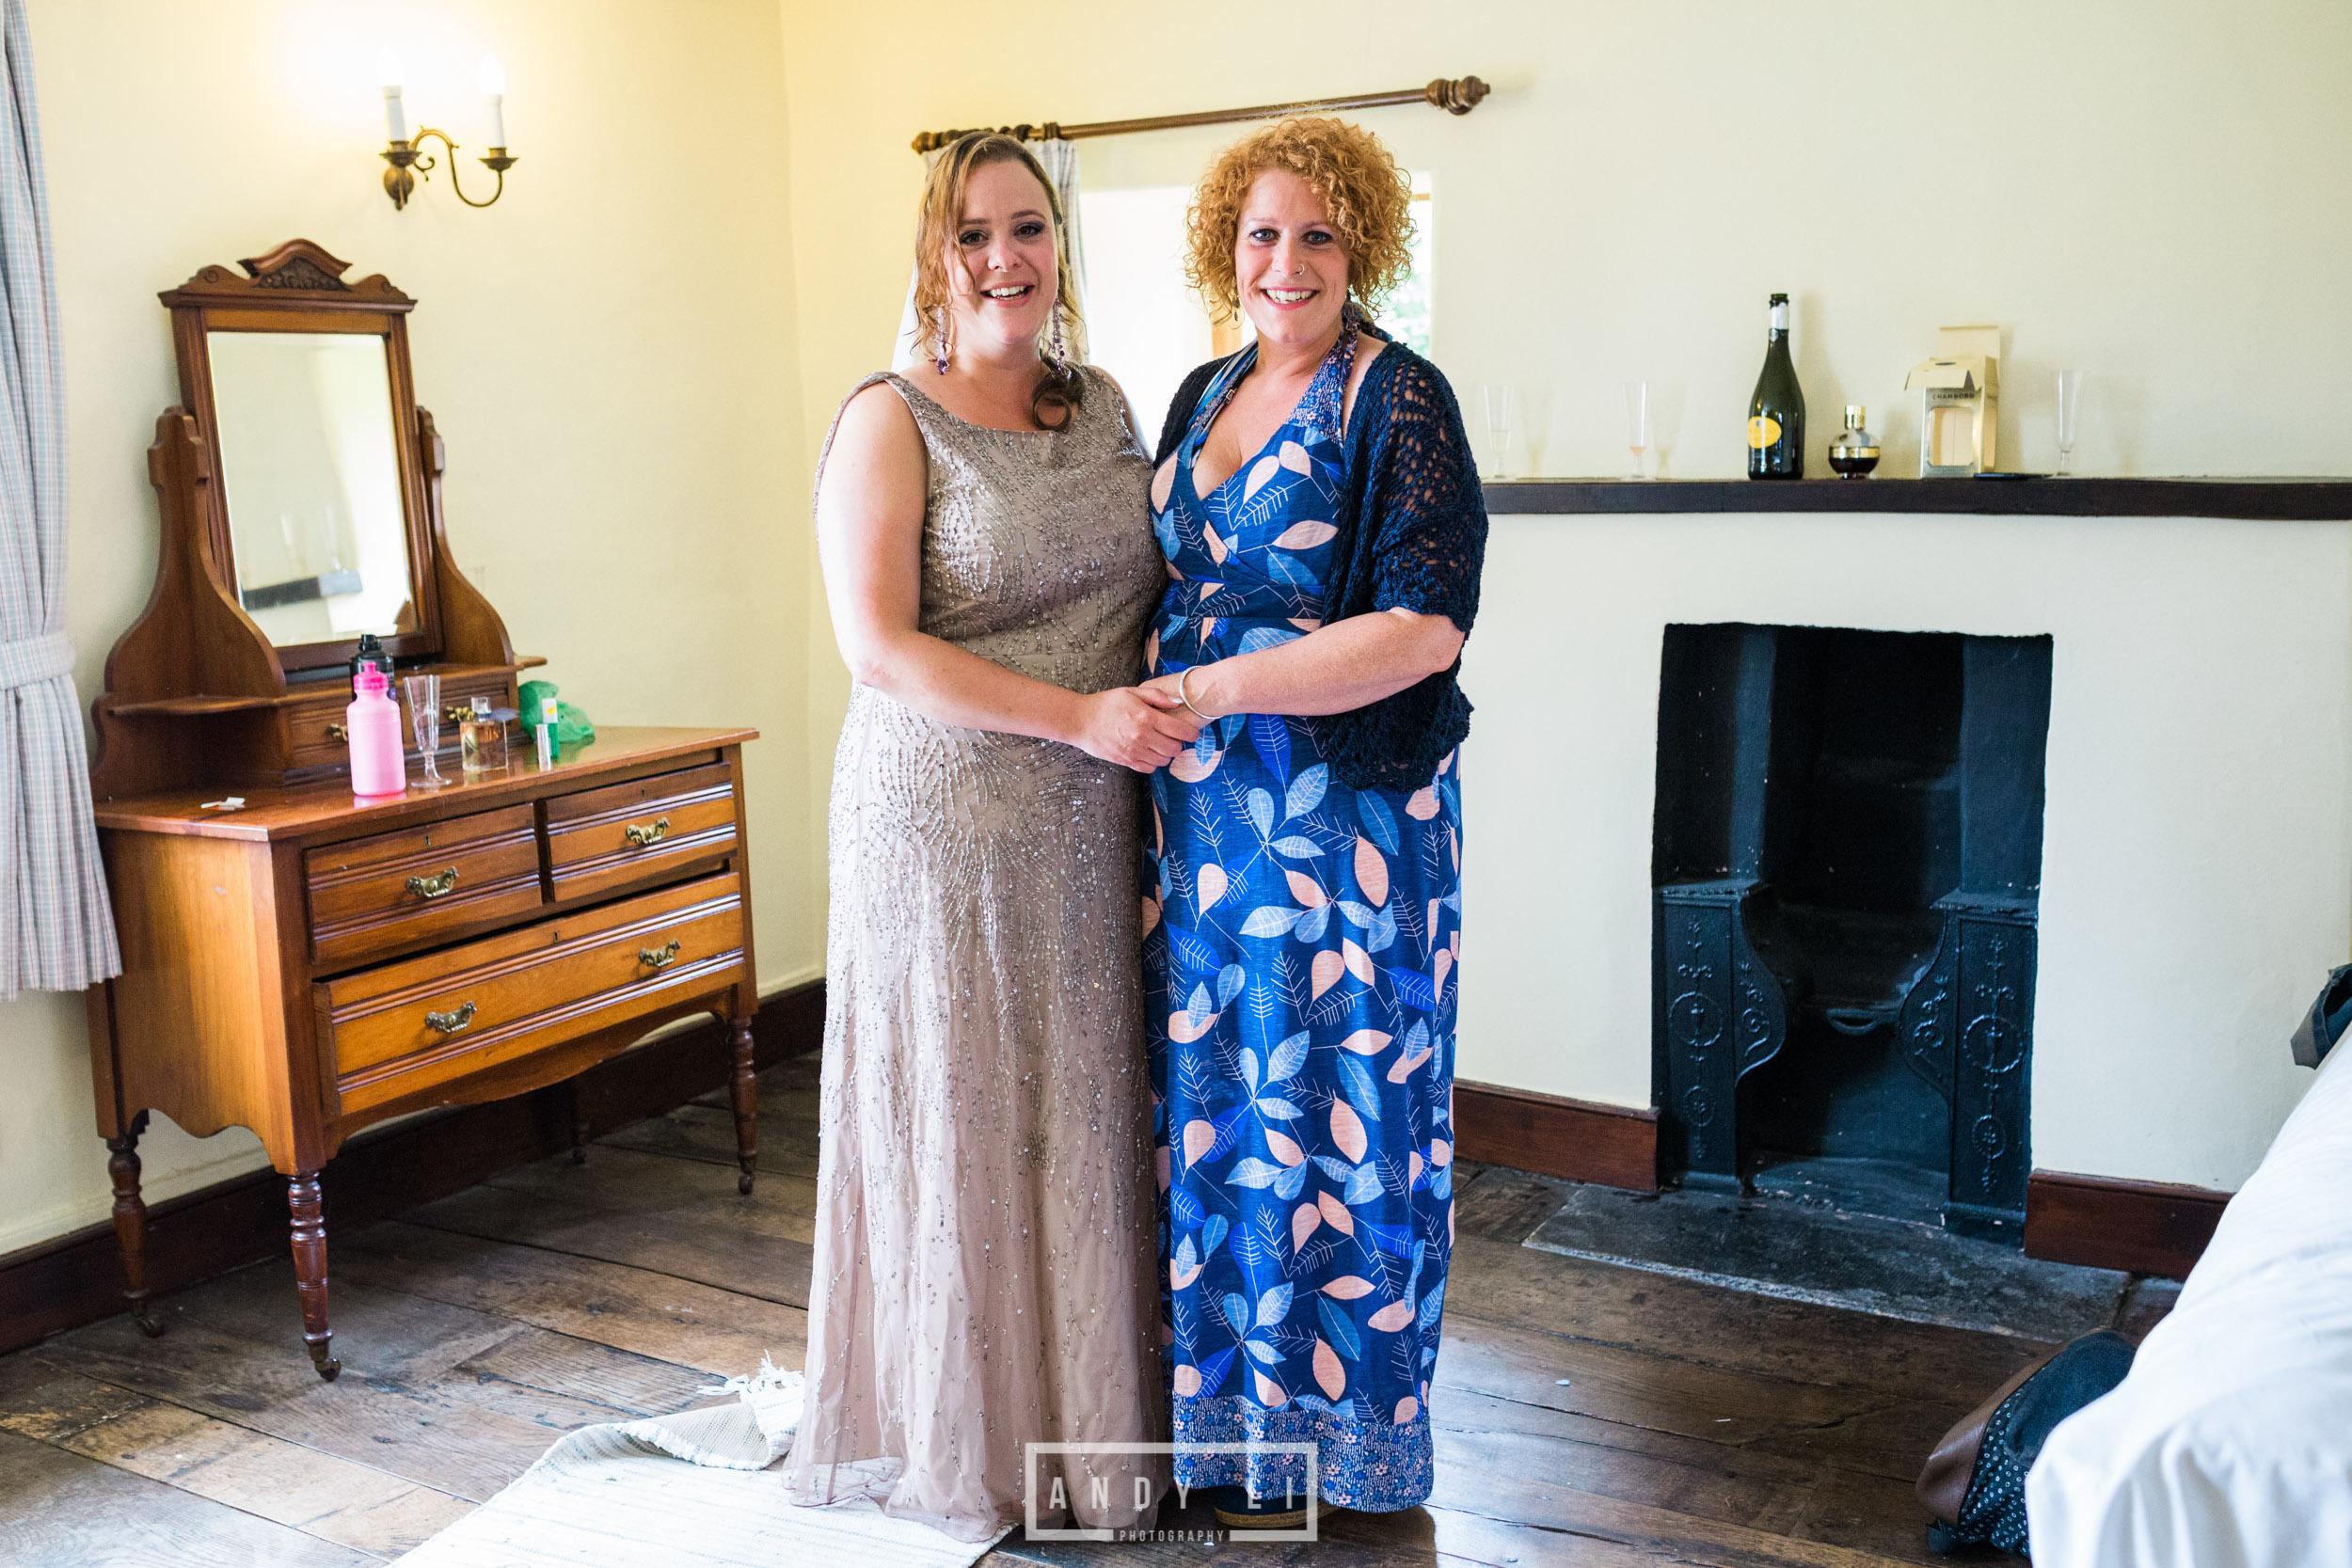 Festival Wedding Shropshire-Andy Li Photography-098.jpg